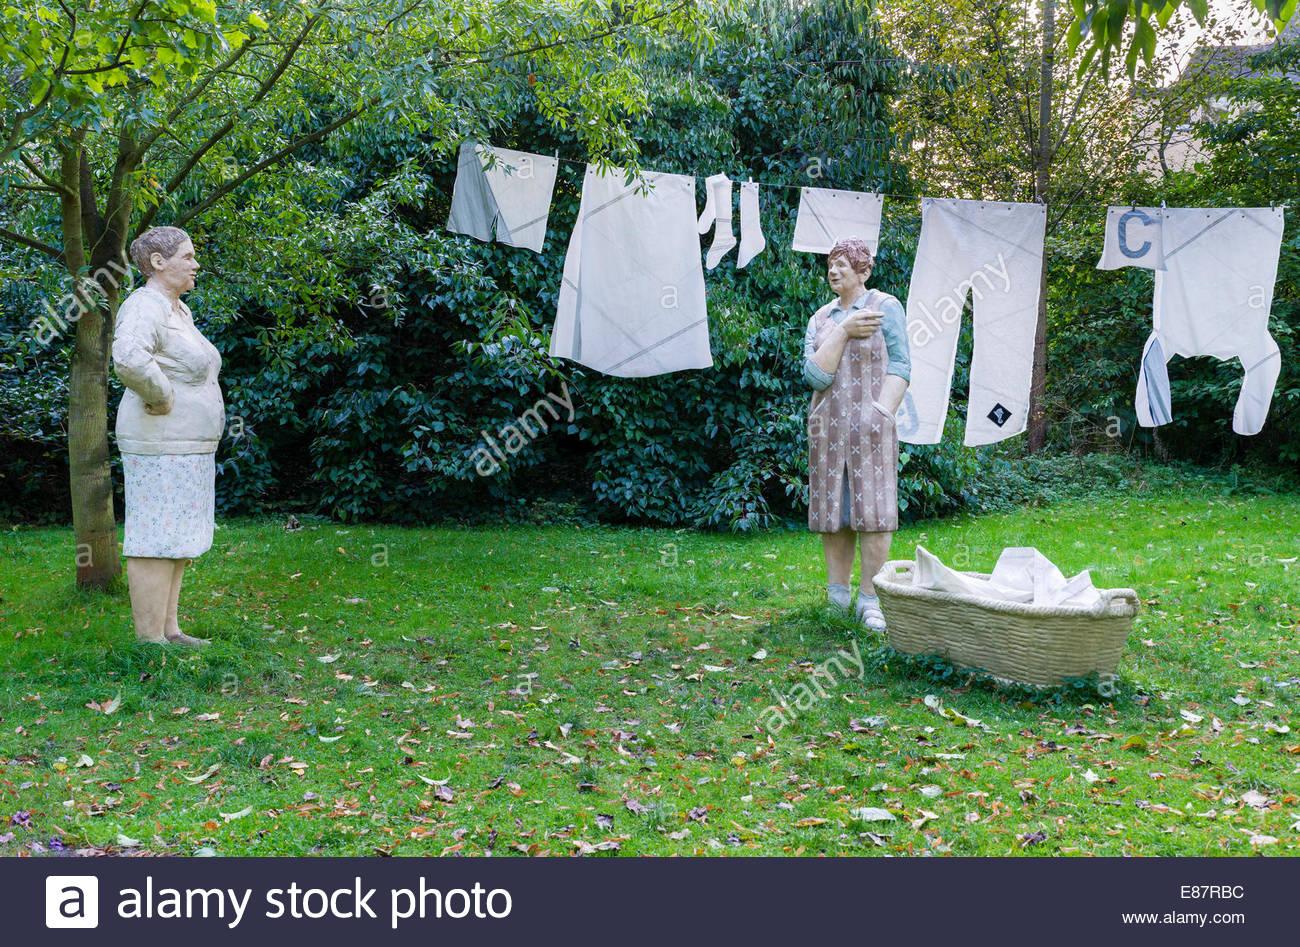 Hanging Laundry Stock Photos & Hanging Laundry Stock Images - Alamy